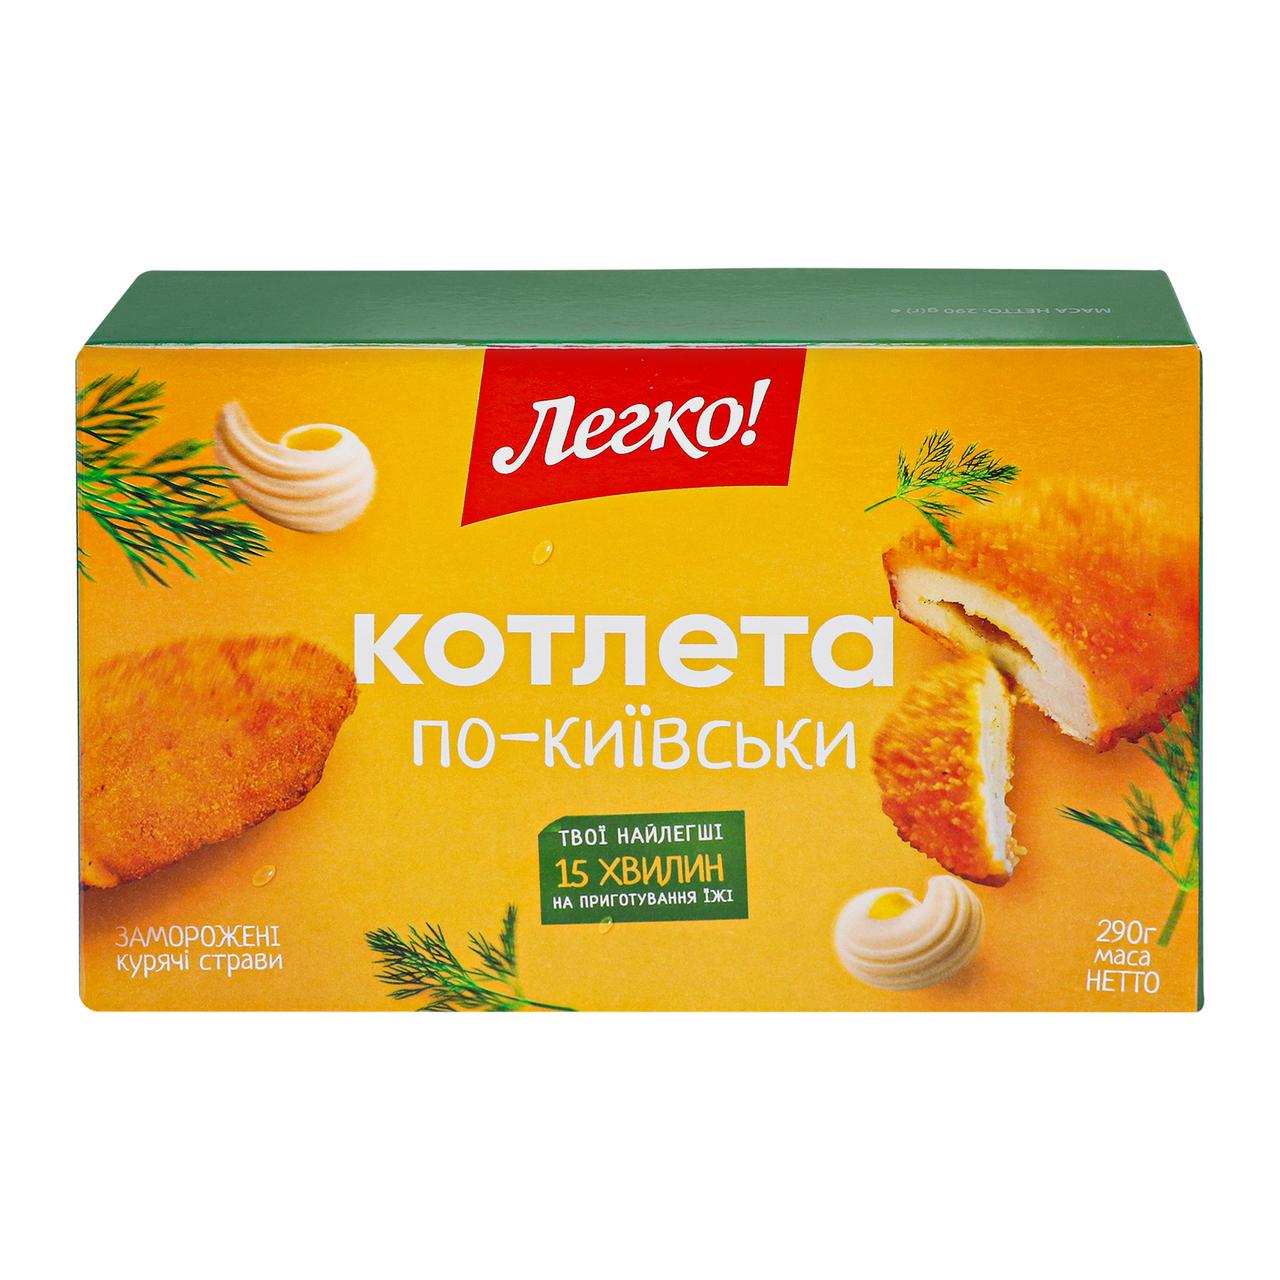 Котлета Легко! По-київськи заморожена 290г